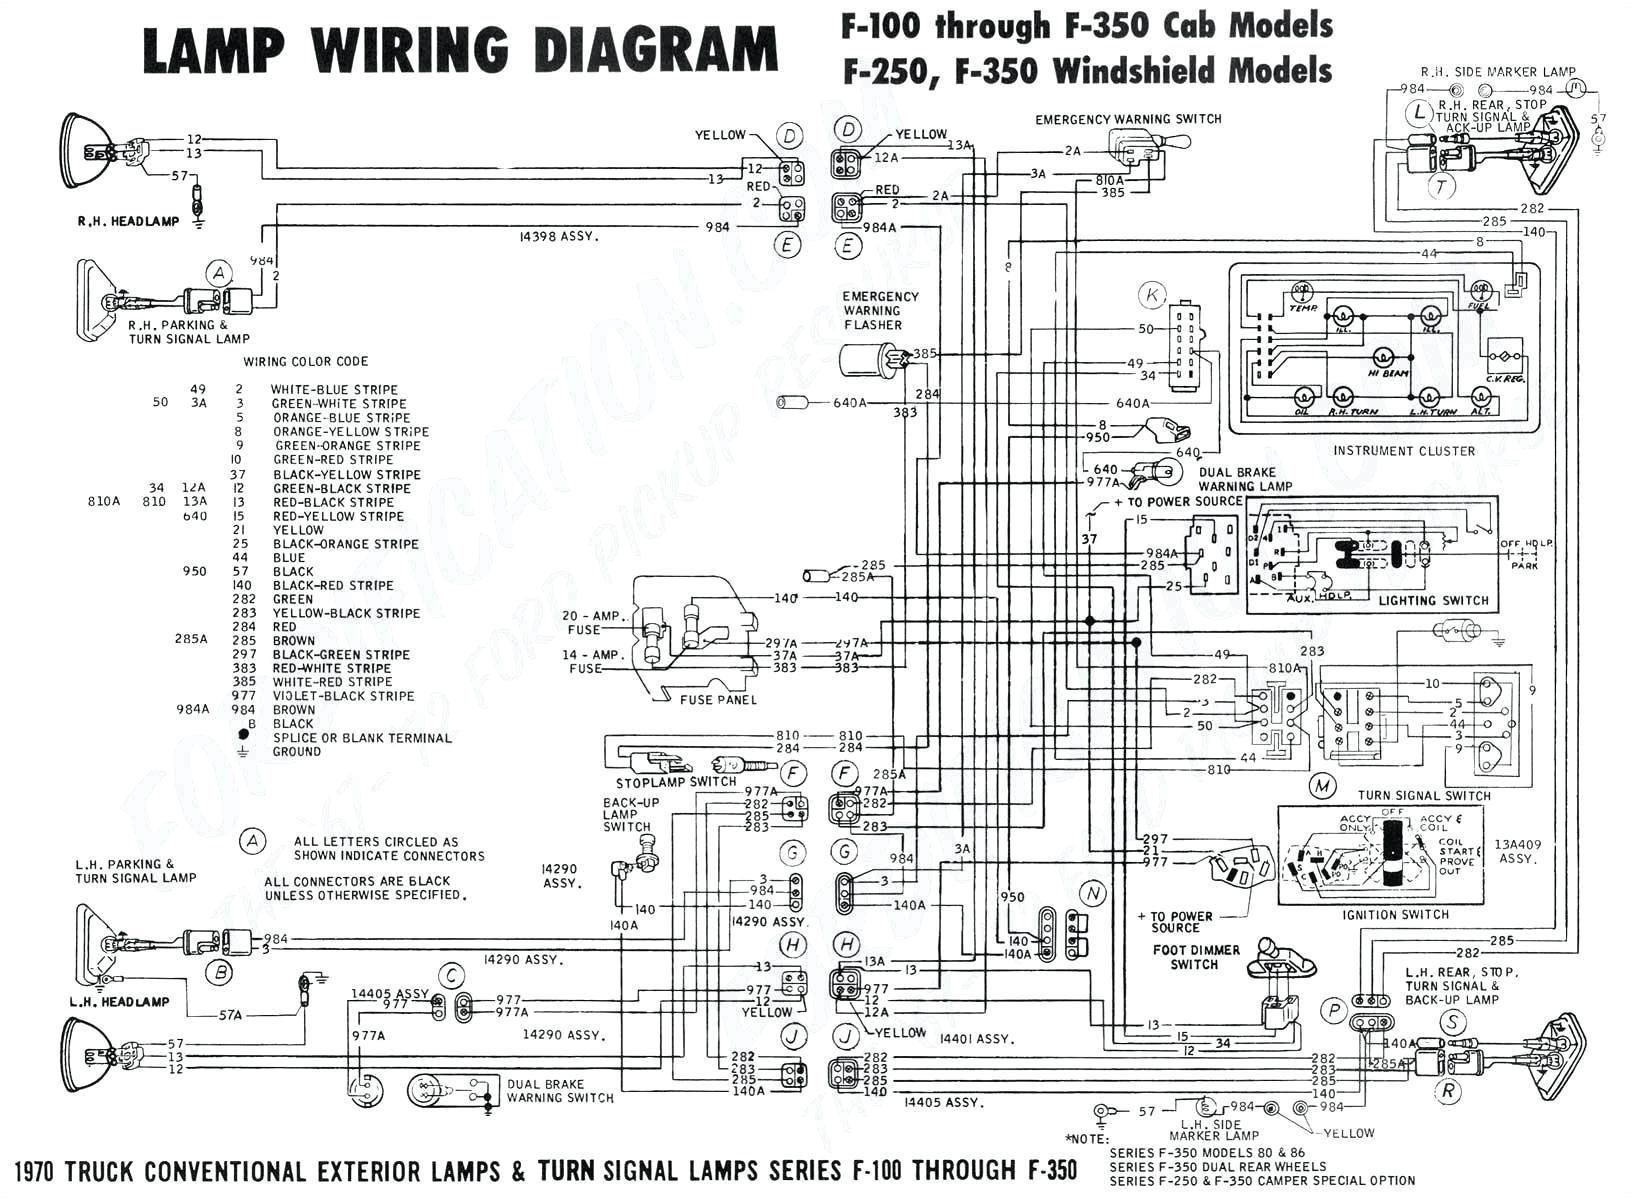 oliver 60 wiring diagram wiring diagram centre95 mustang gt fuse box wiring diagram centre oliver